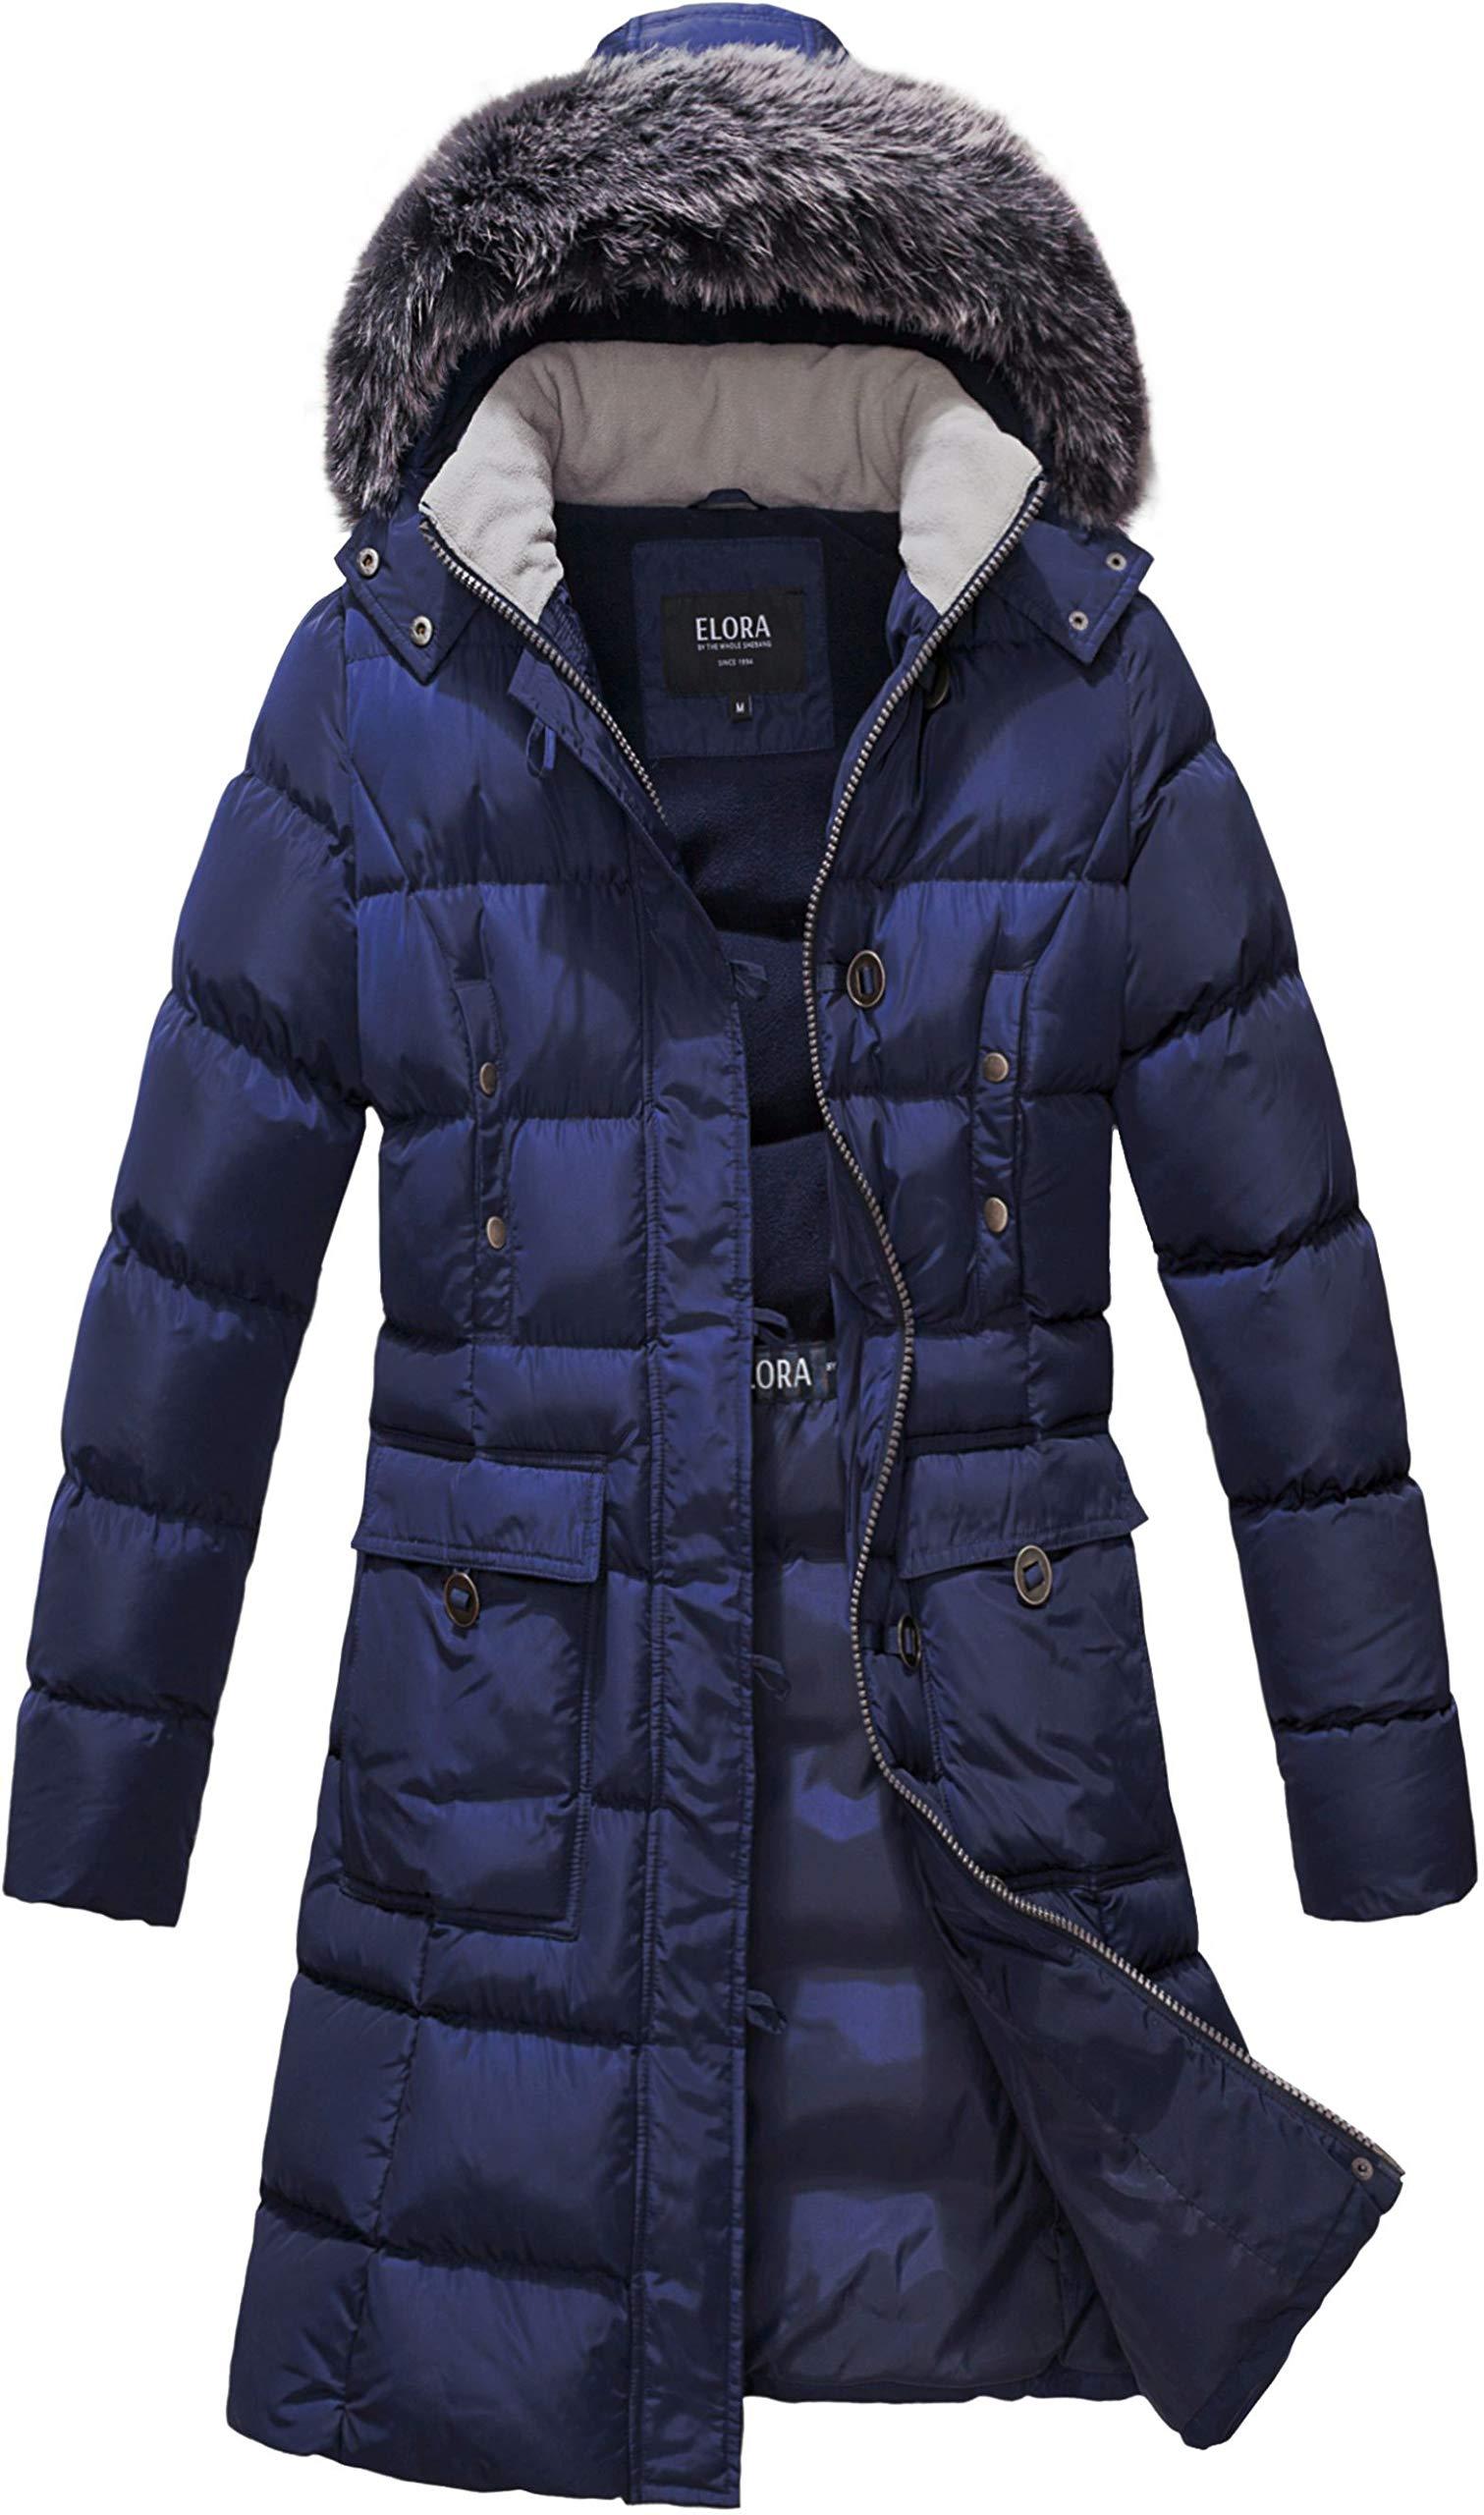 ELORA Women's Winter Puffer Mid Length Cargo Pocket Coat Fur Trim Removable Hood, Navy, Large by ELORA